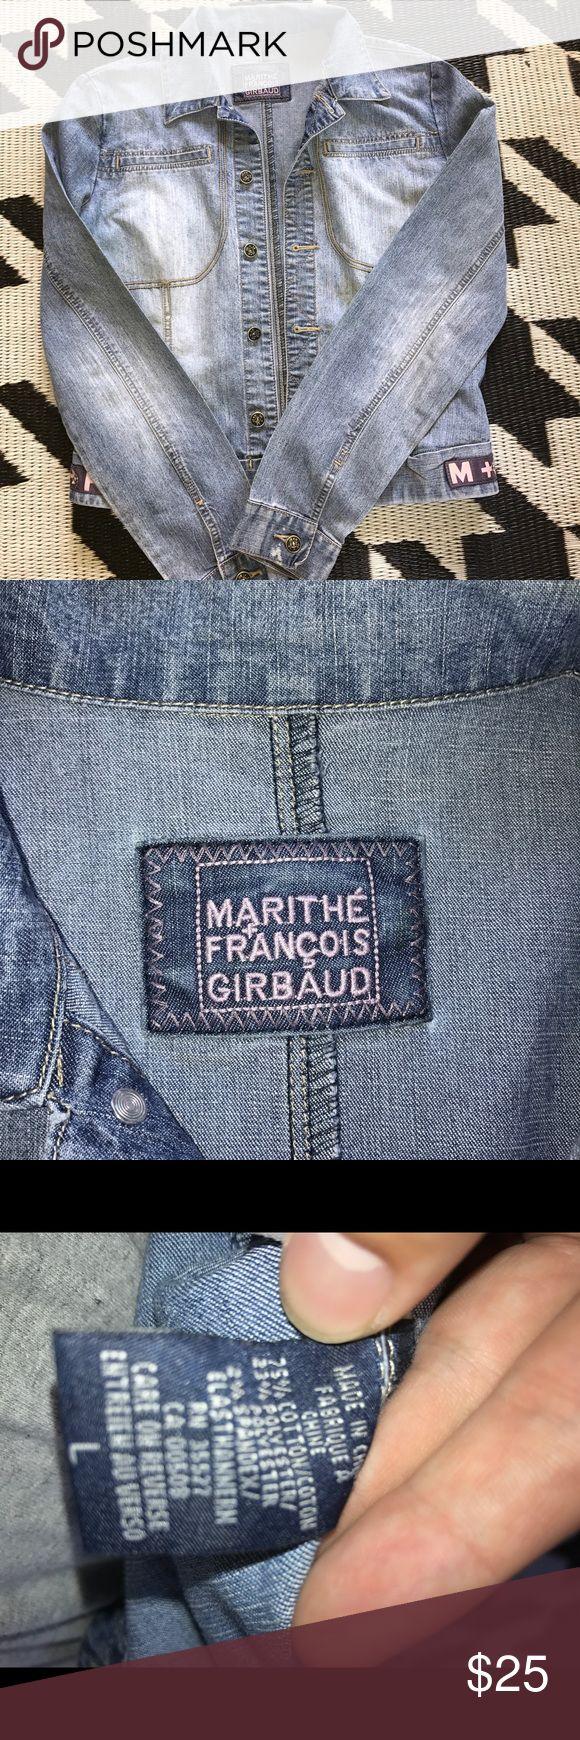 Womens denim jacket Marithe Francois Girbaud Nice women's denim jacket in great shape. Size large. Marithe Francois Girbaud Jackets & Coats Jean Jackets